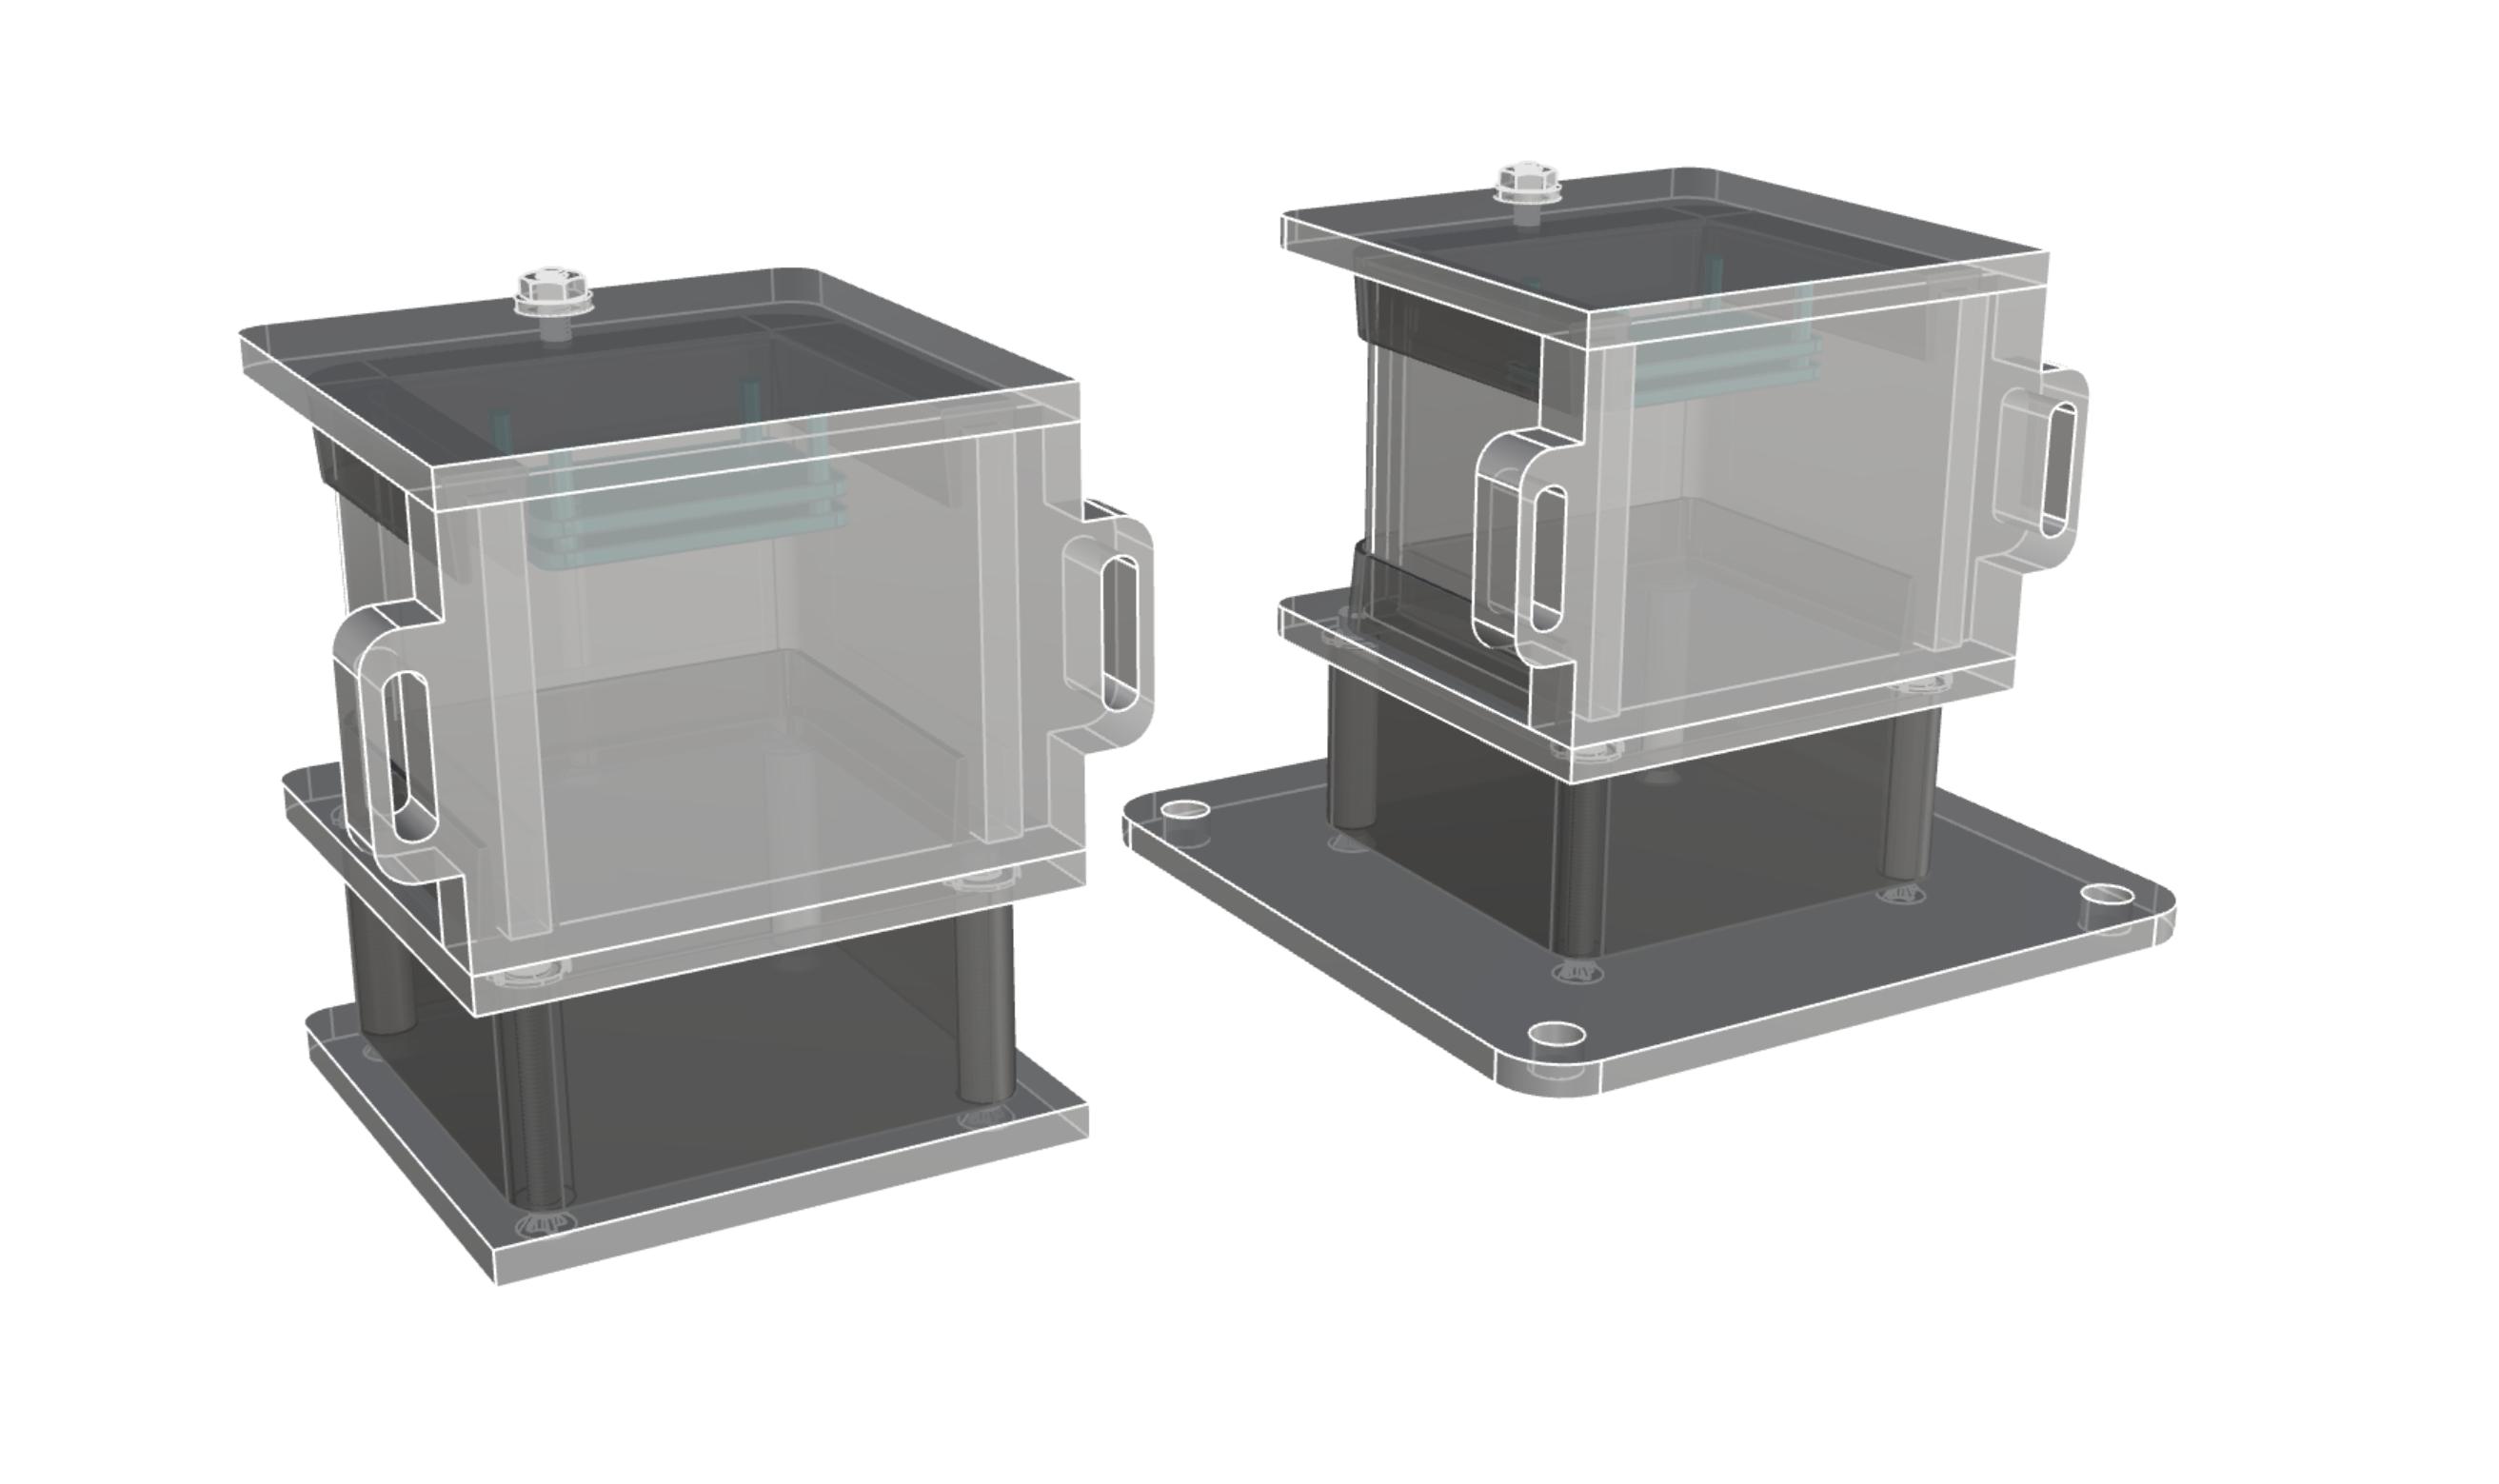 Sound boxes 2 sknb4dc3jf